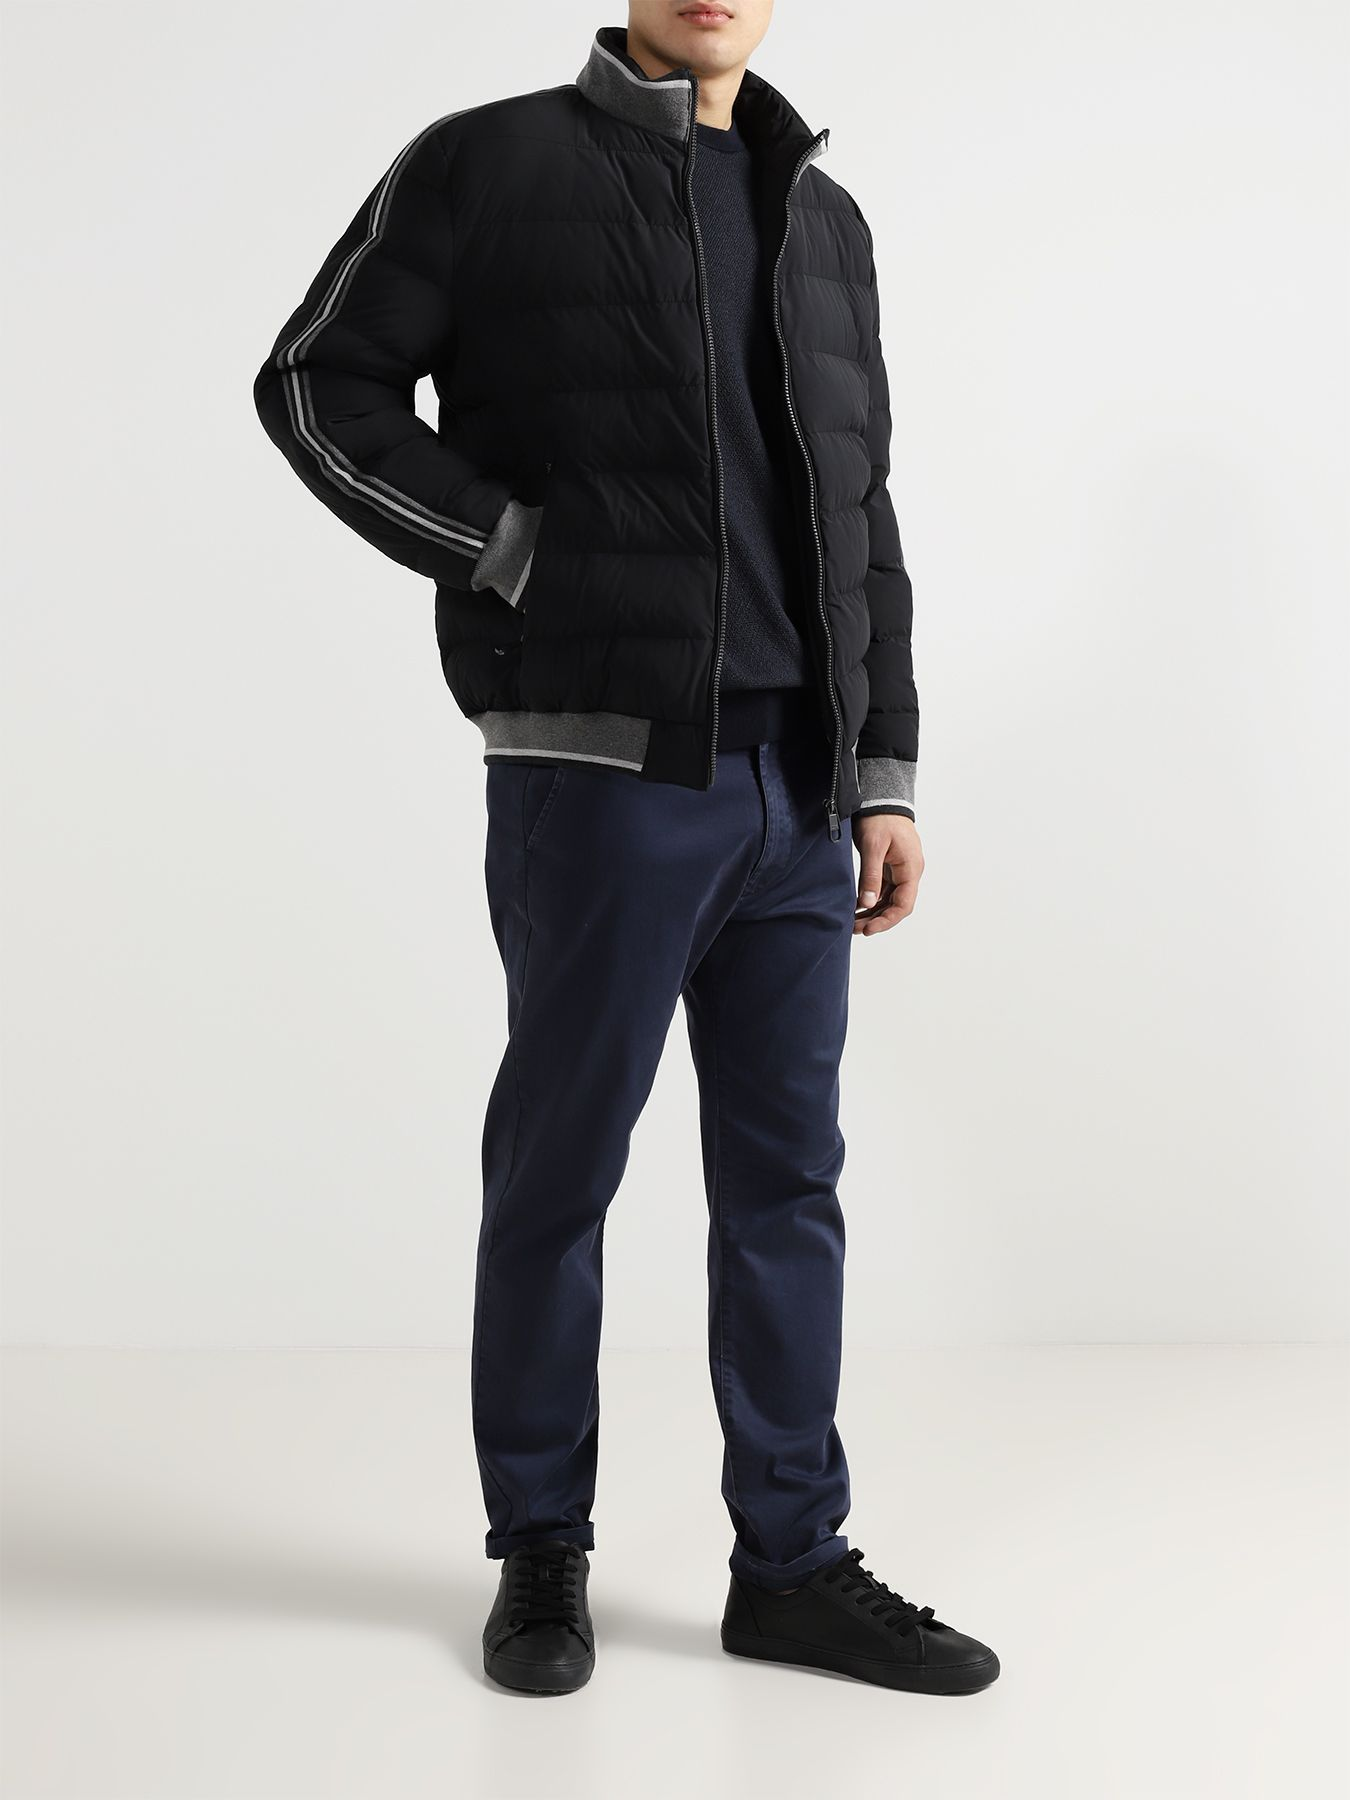 Куртка Pierre Cardin Мужская куртка